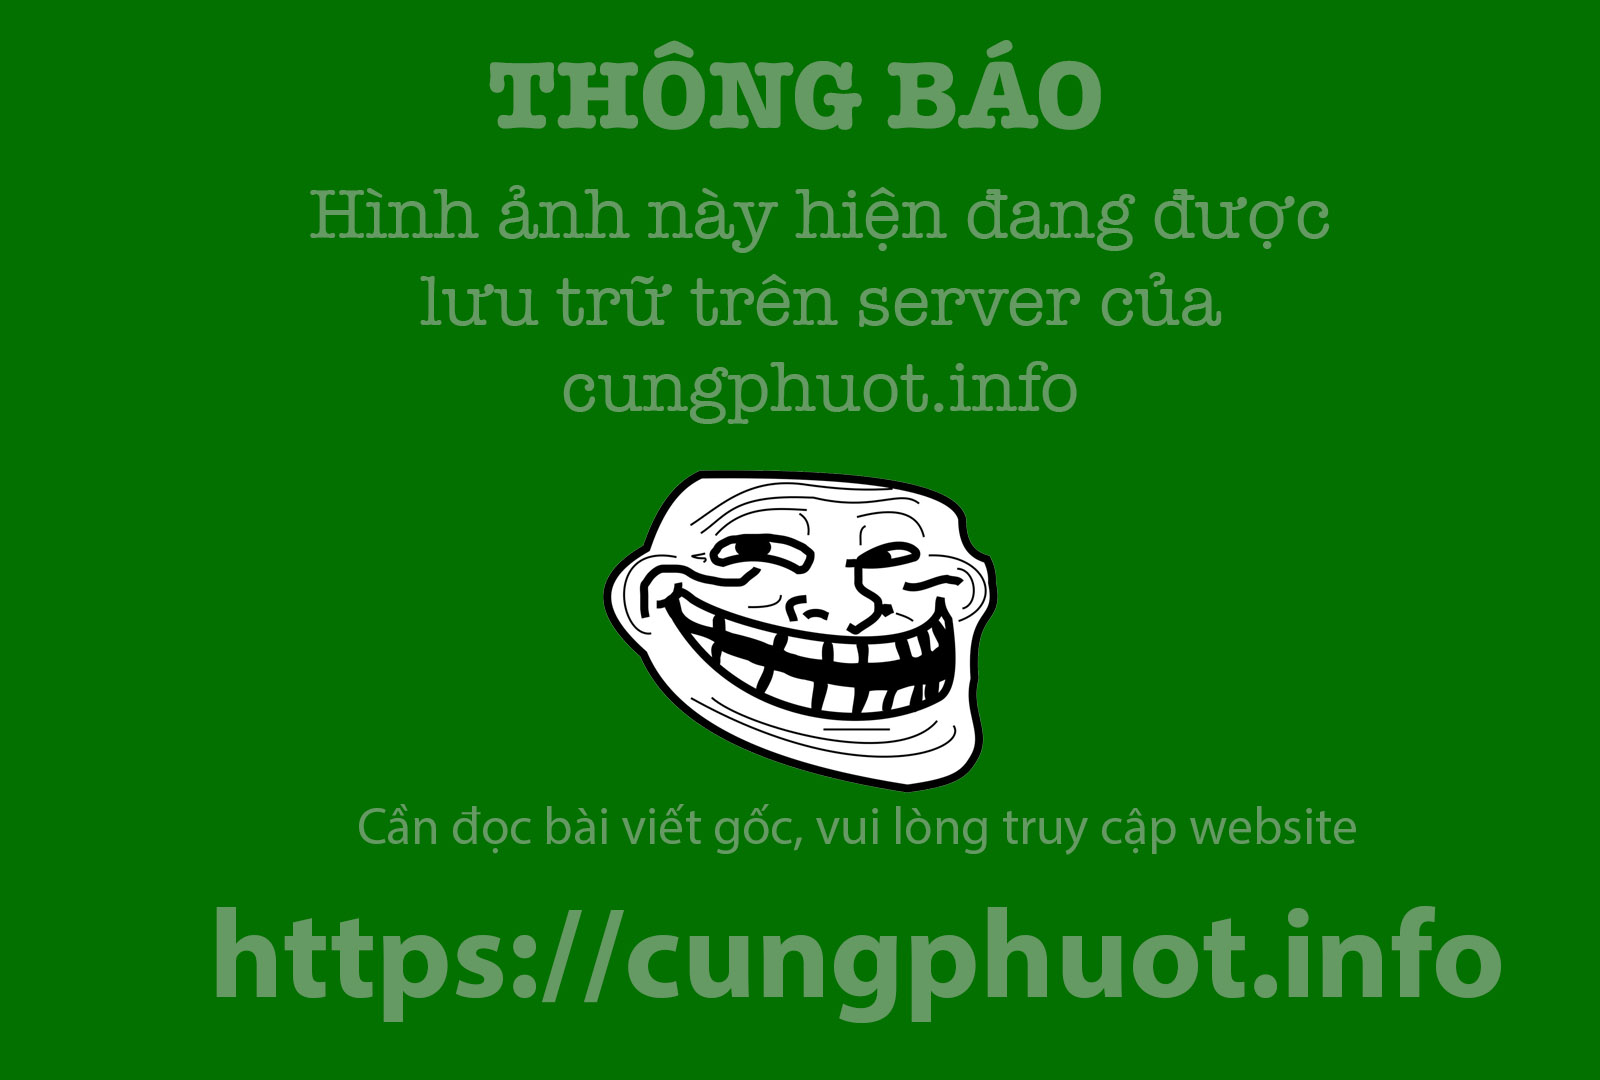 Den Moc Chau san mai anh dao hinh anh 11